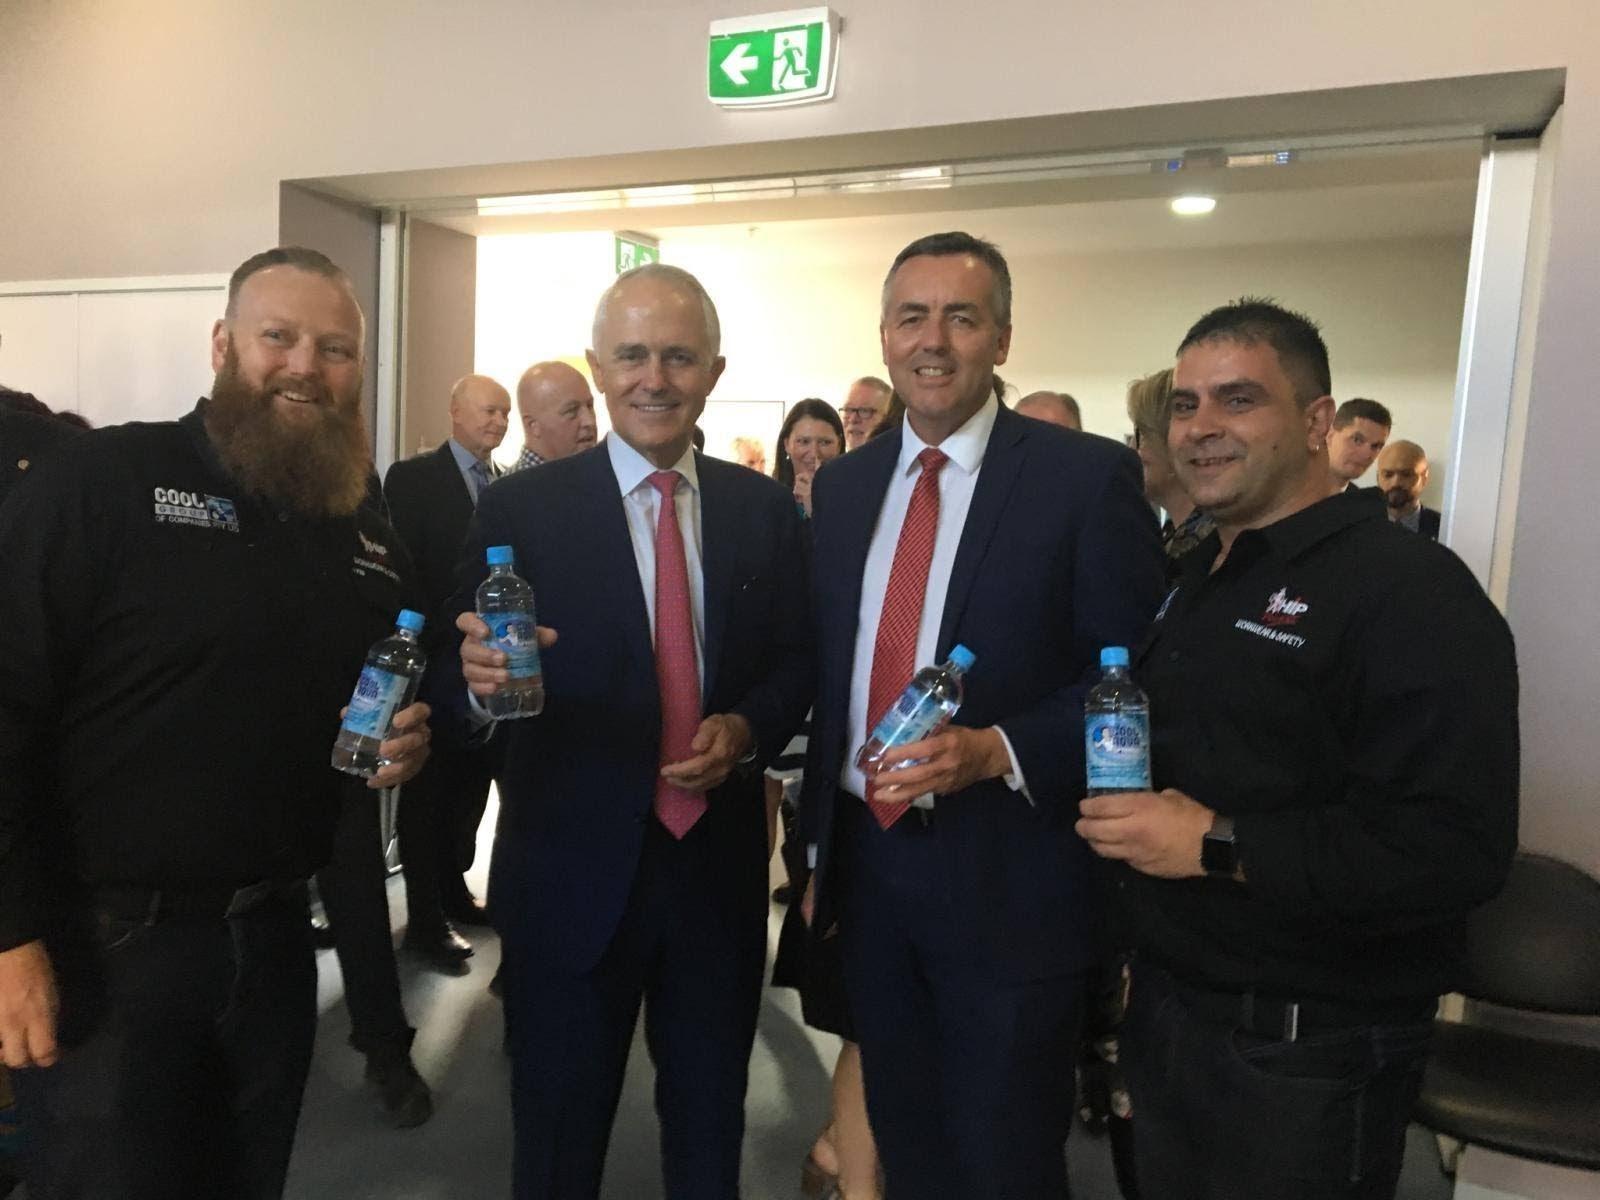 Alfi Prestipino, Gareth Williams and Malcom Turnball each enjoying a bottle of refreshing Cool Aqua Springs wate